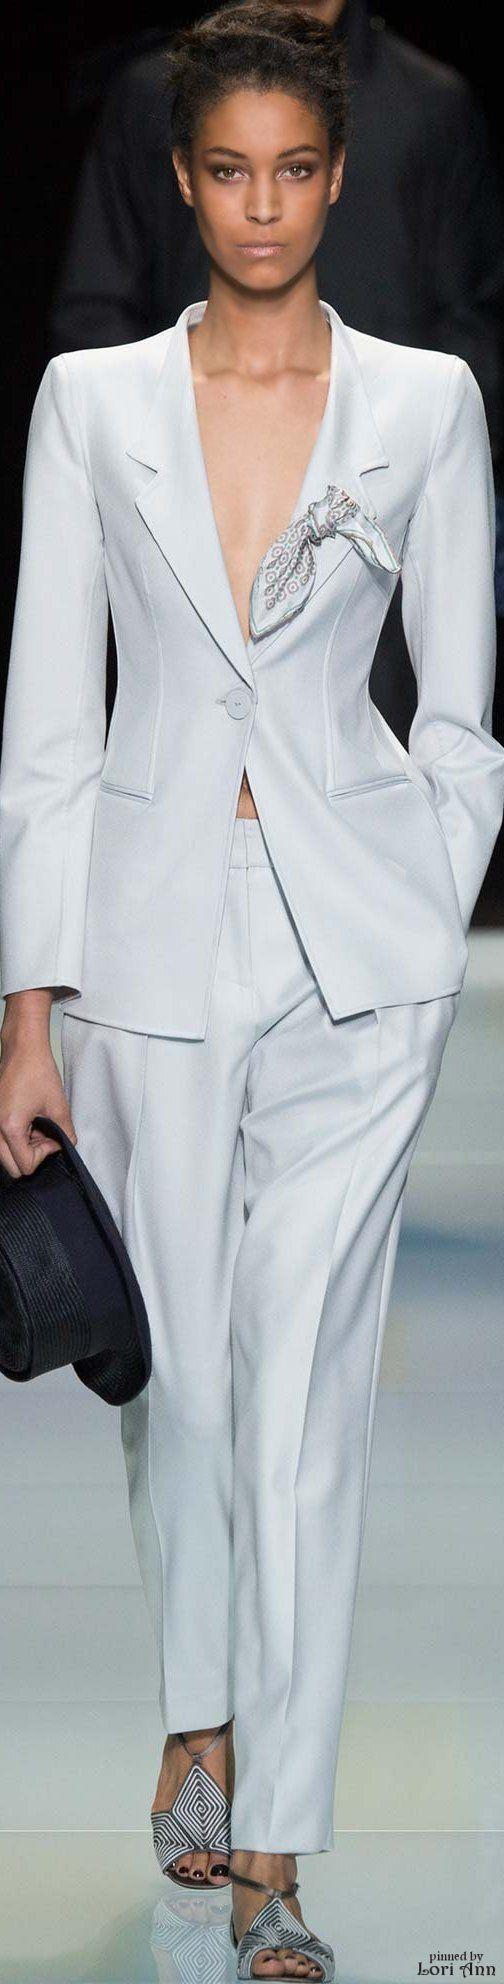 464 best ☙ Armani Fashion ☙ images on Pinterest | Giorgio armani ...